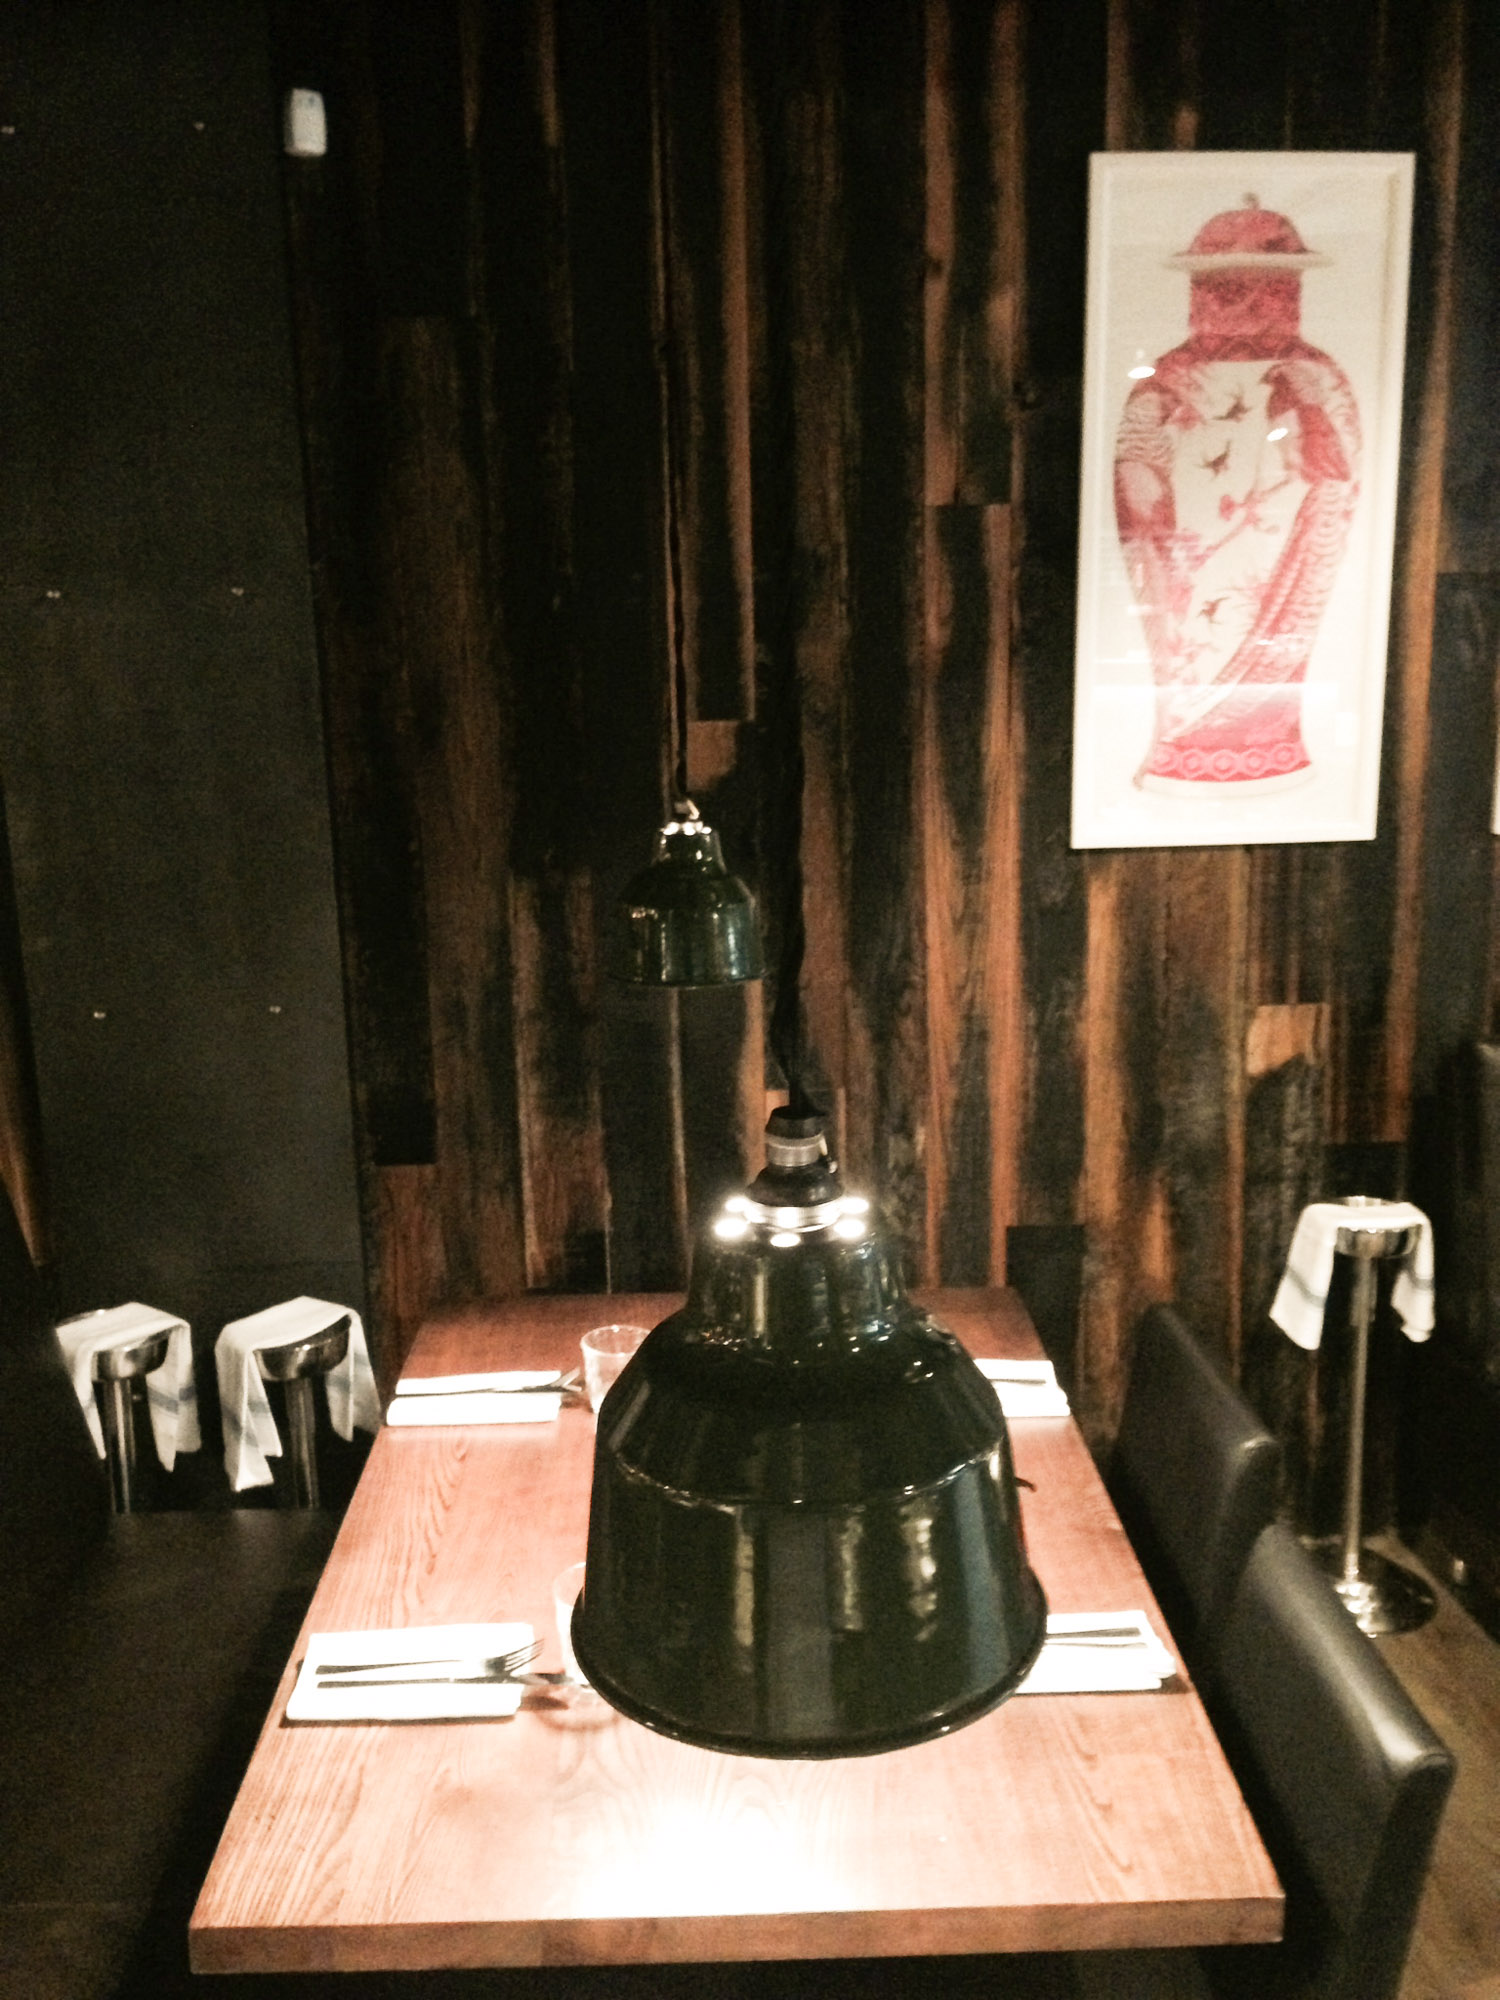 BHSTA- Restaurant table and vase image Web.jpg